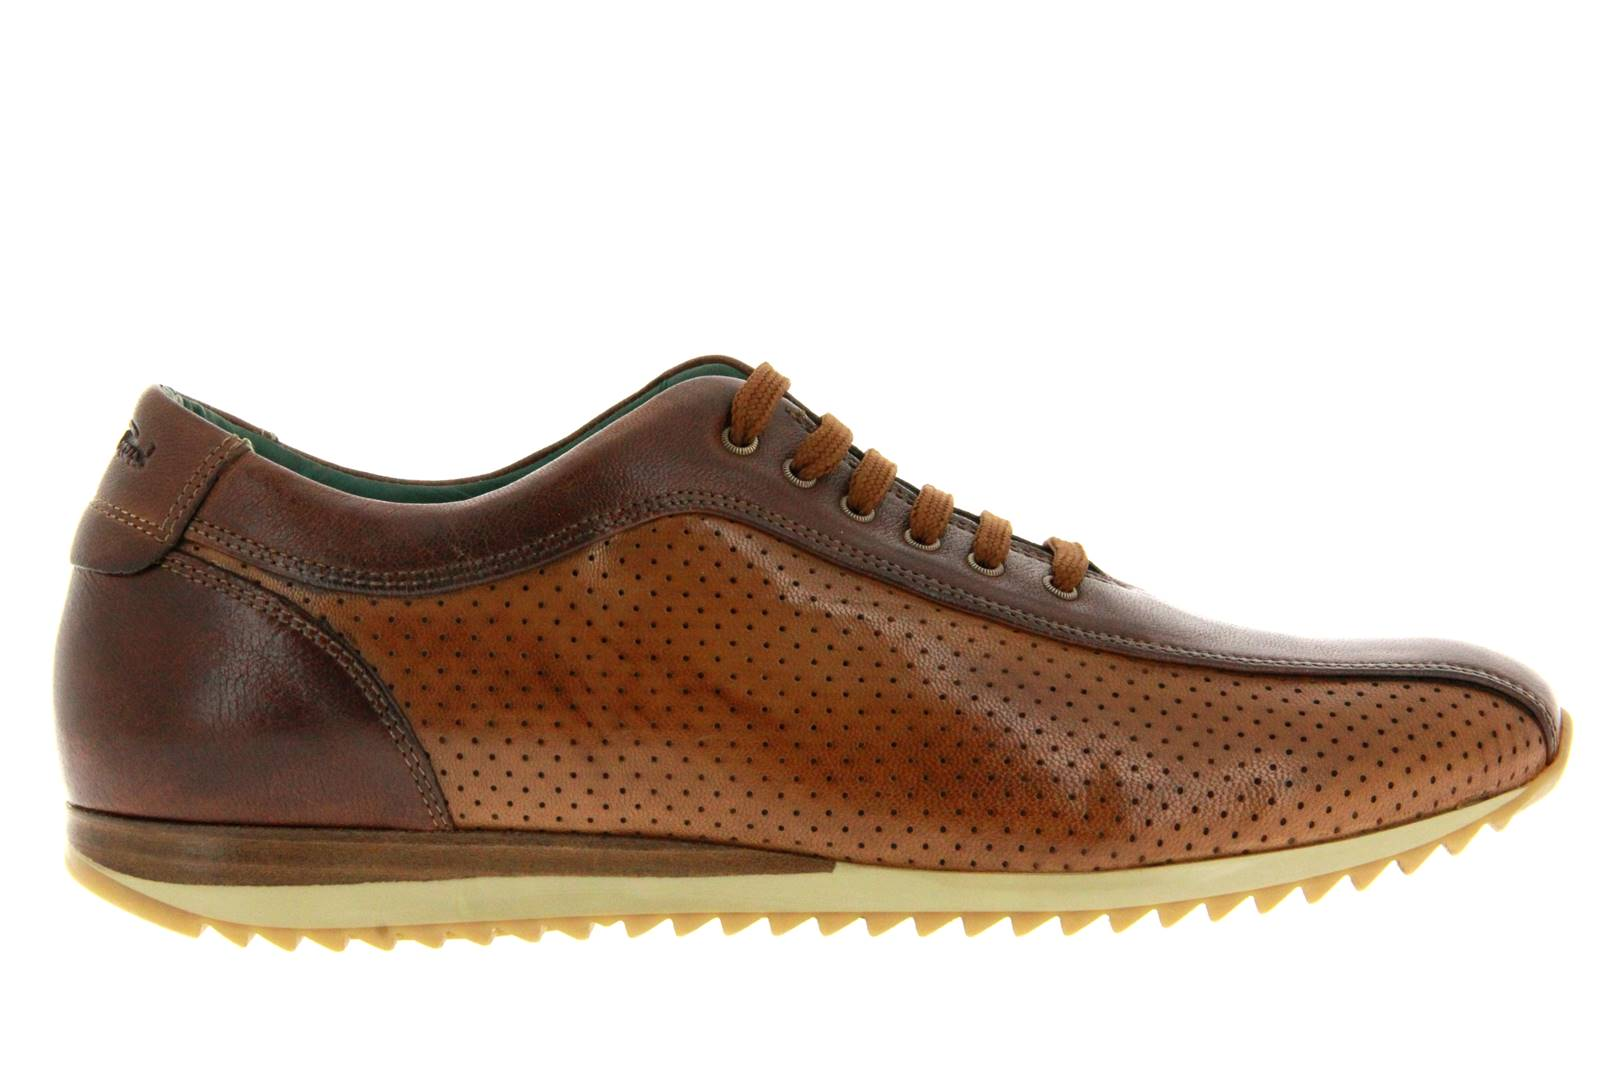 Galizio Toressi Sneaker CUOIO BROWN COGNAC (41)